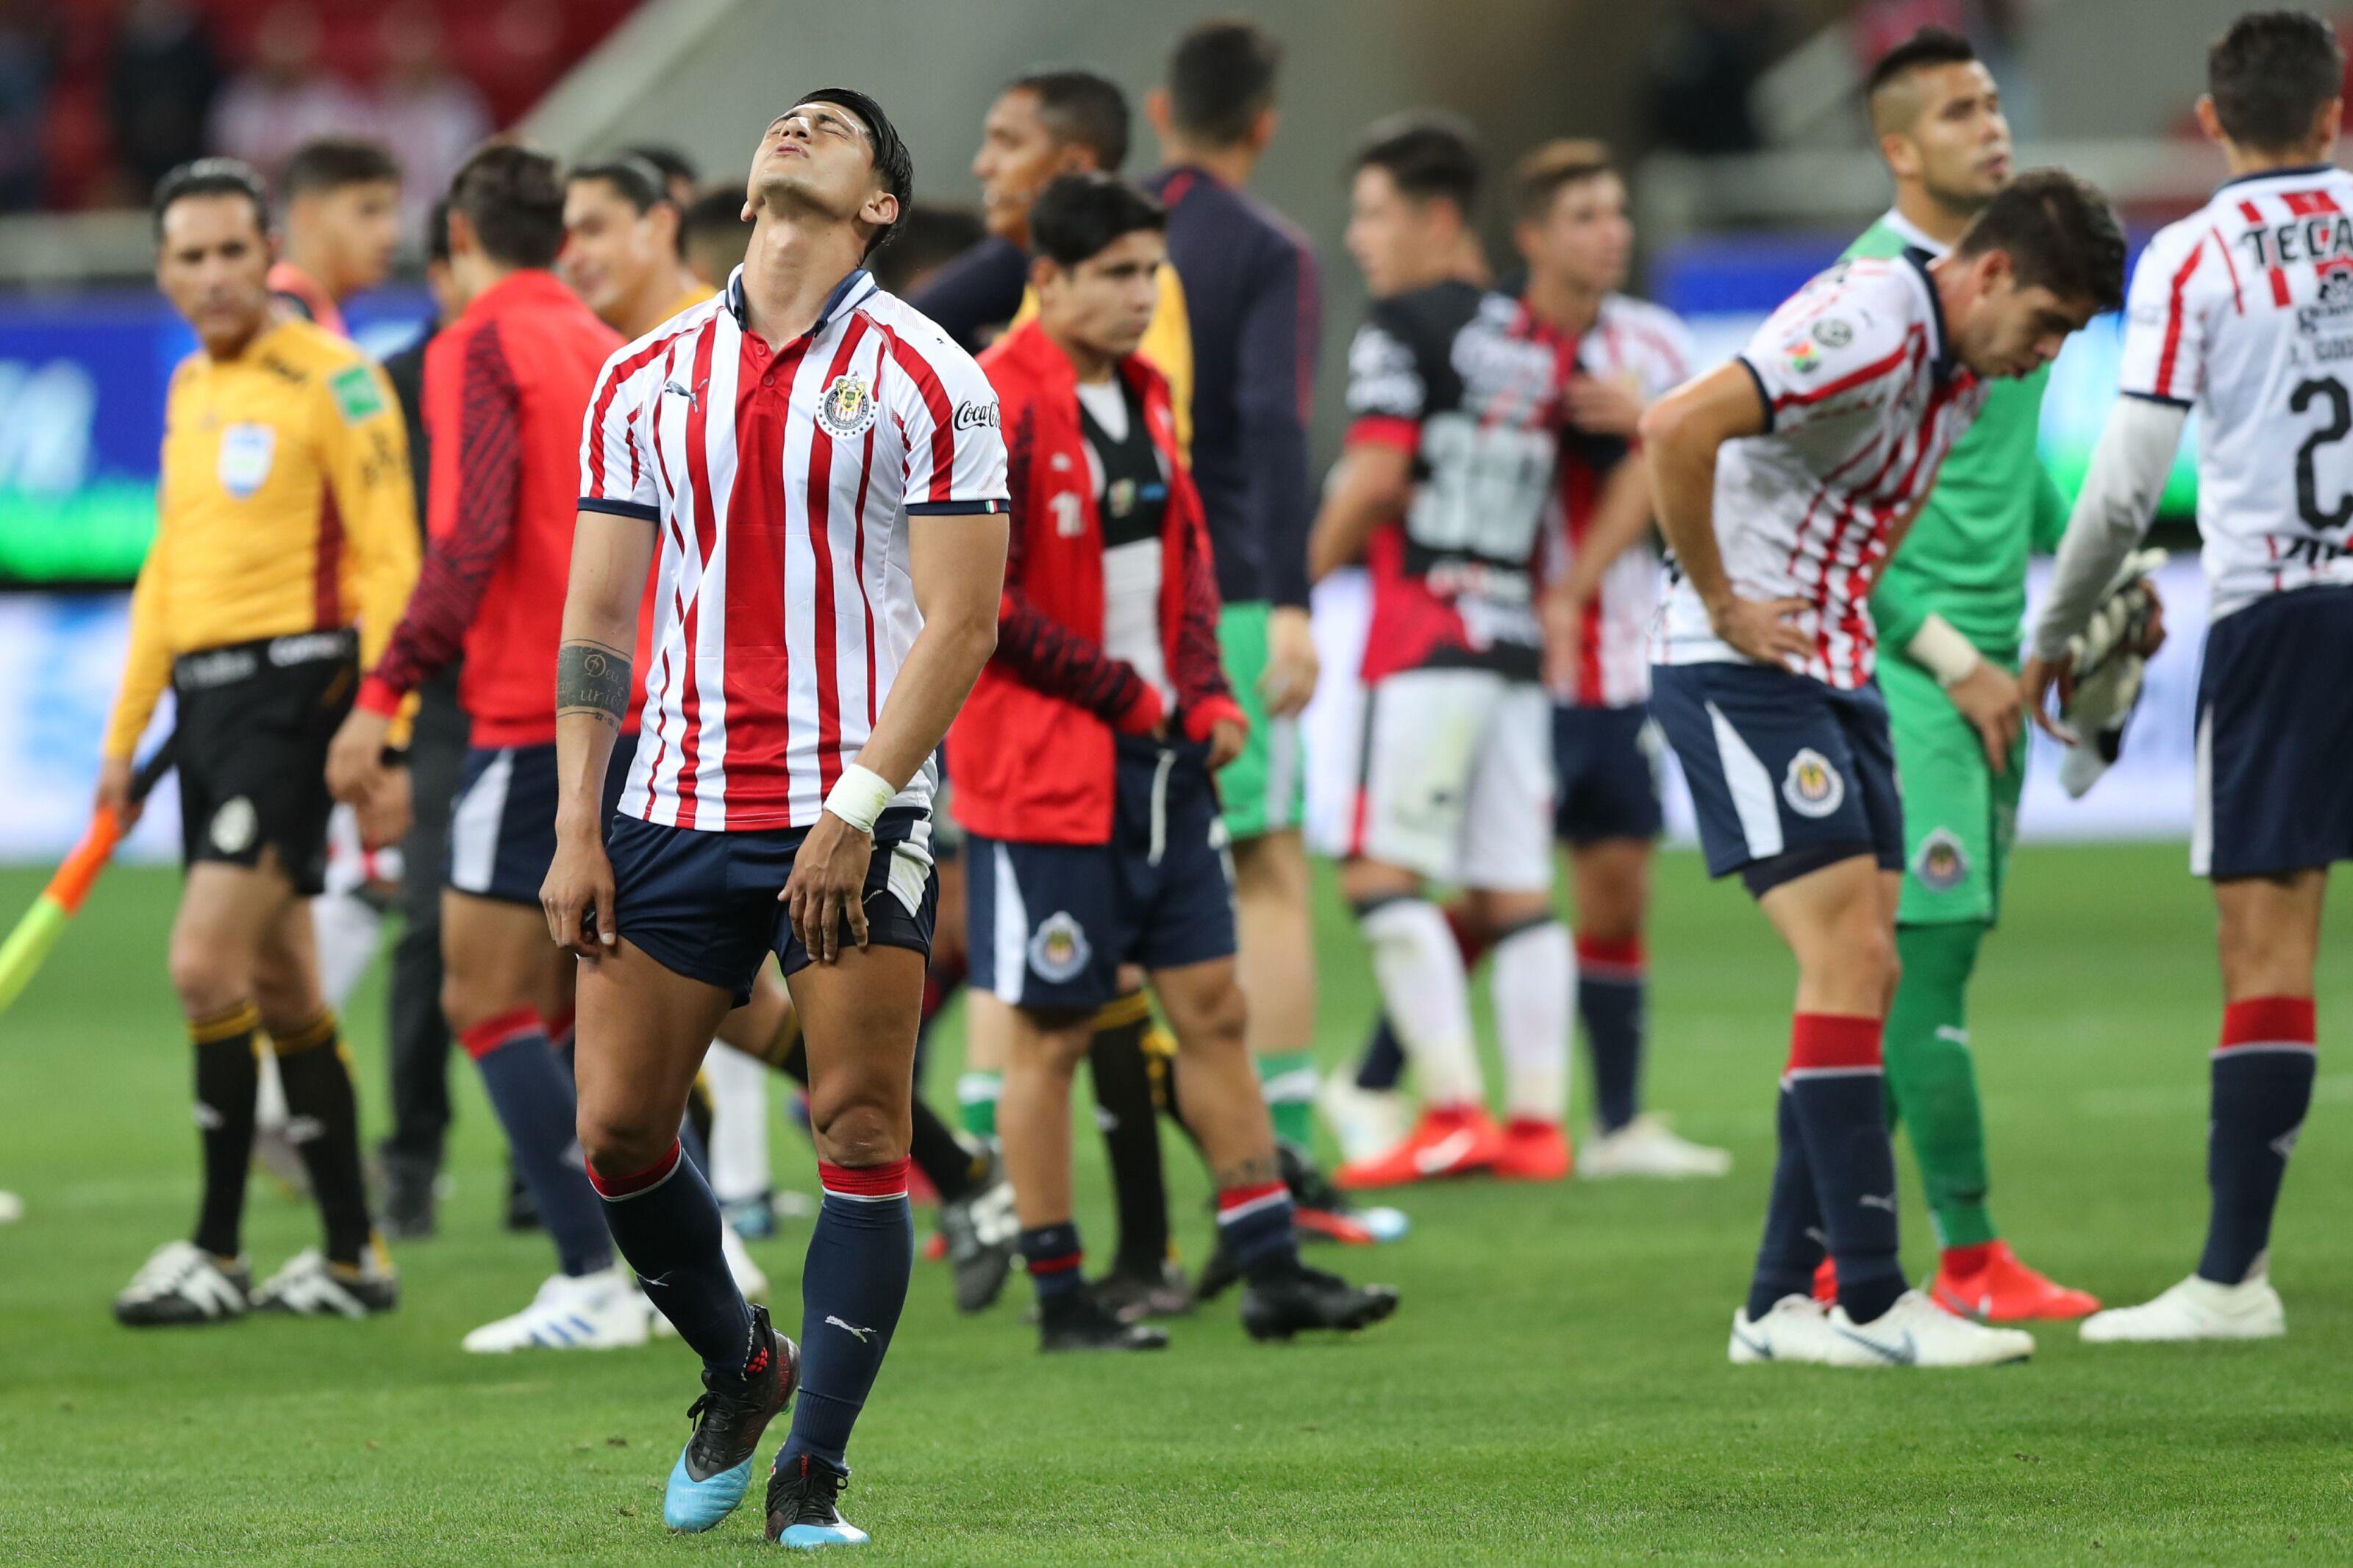 6c18f82ab Lobos BUAP move up 3 spots after embarrassing Chivas